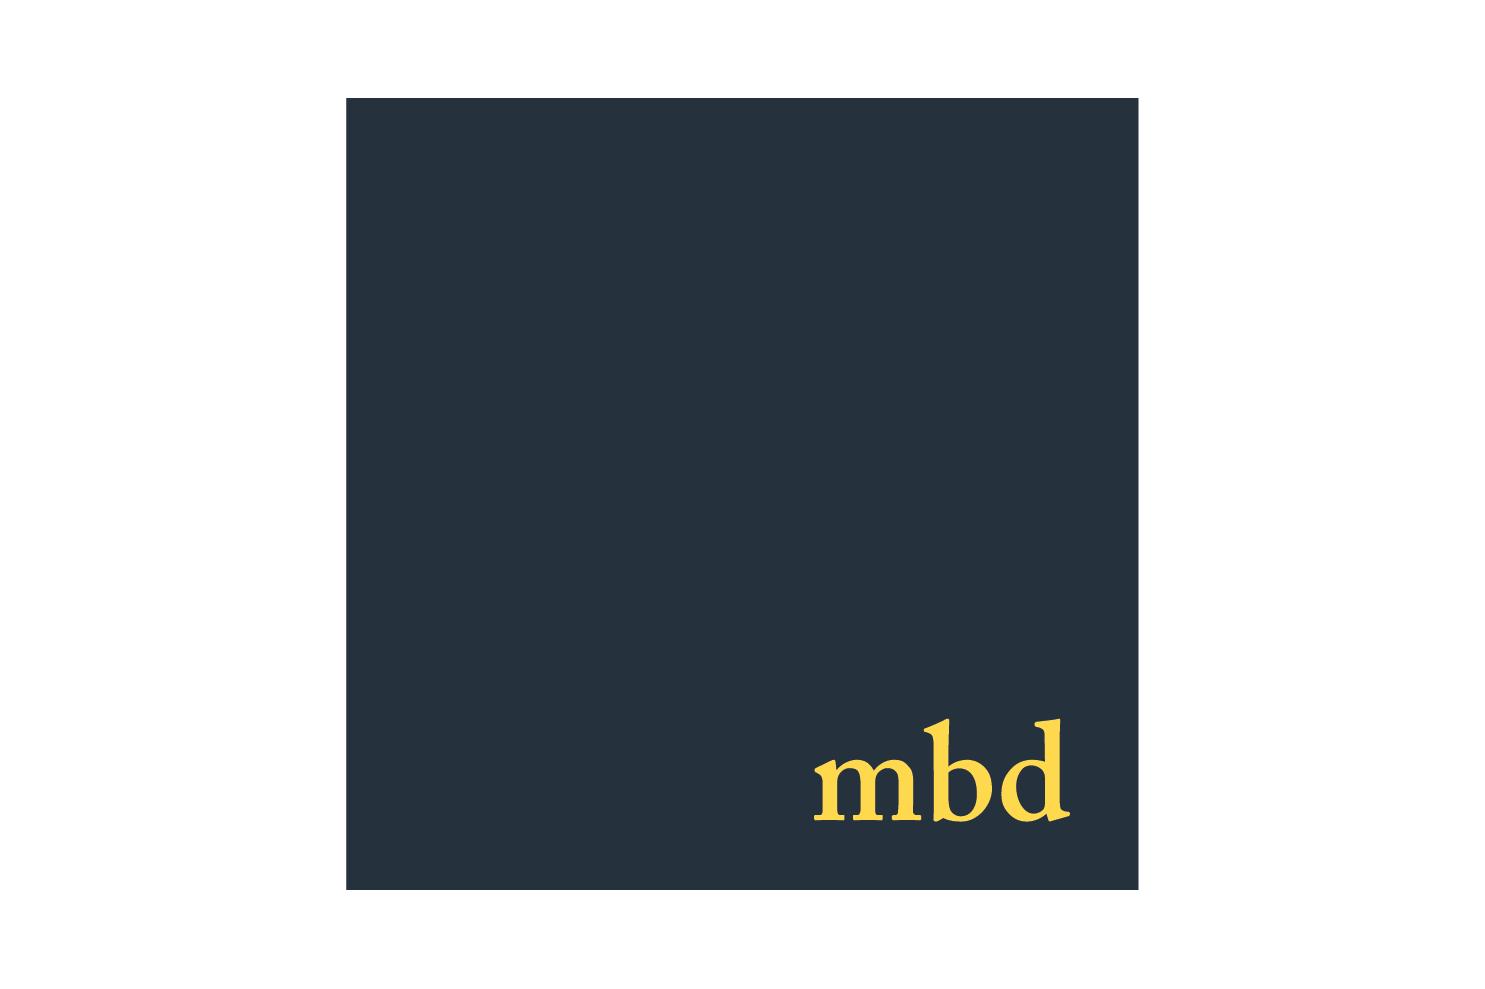 mbd.png